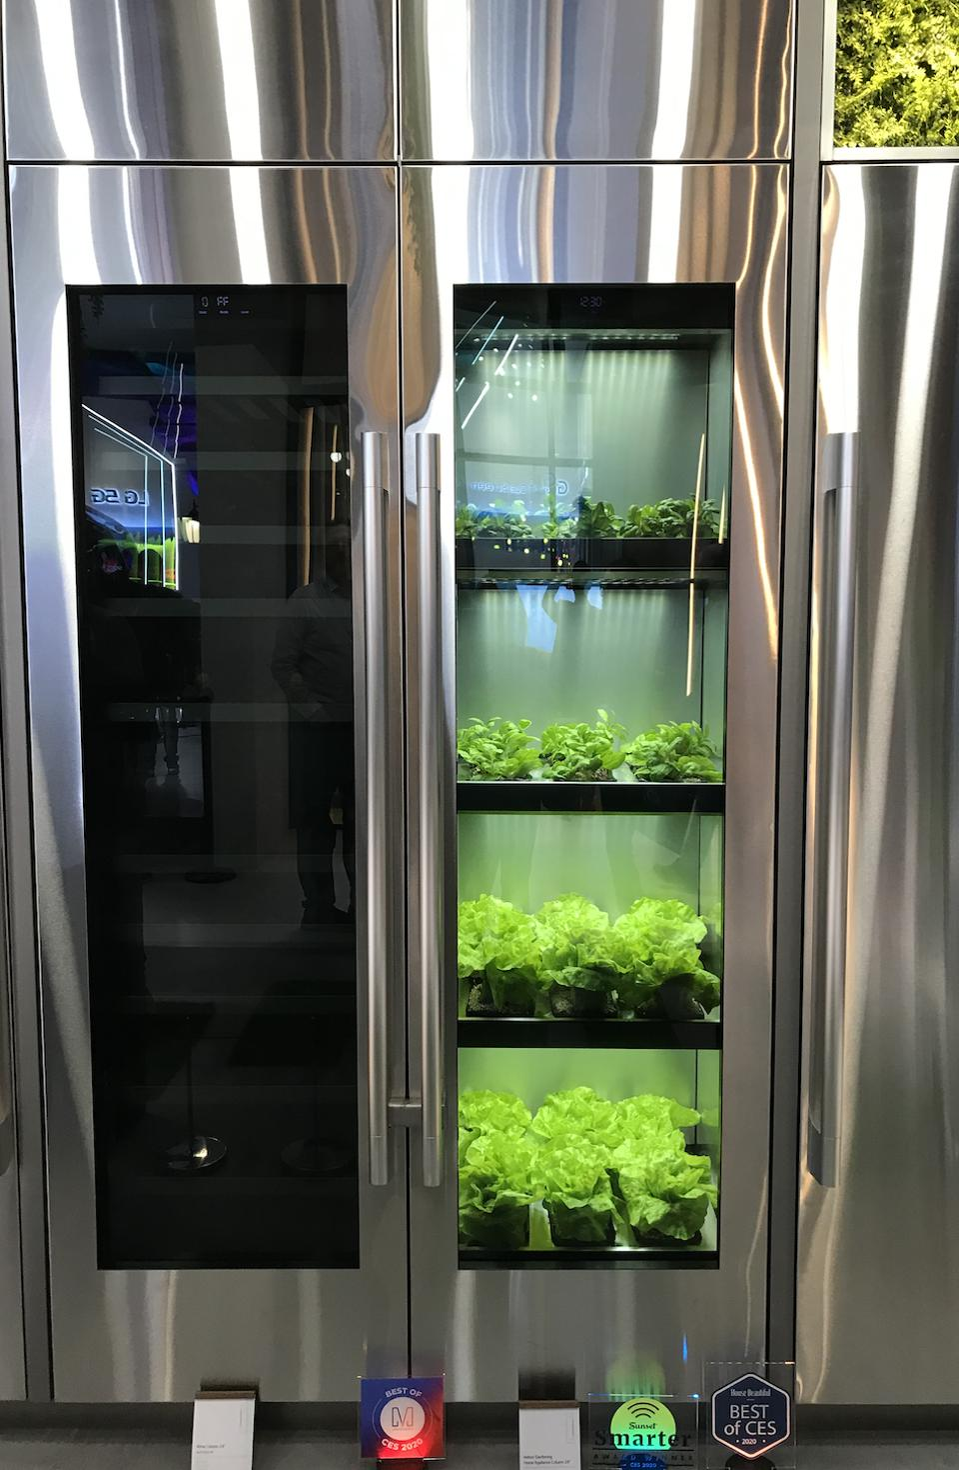 LG's Home Gardening Cultivator targeting U.S. market 2021